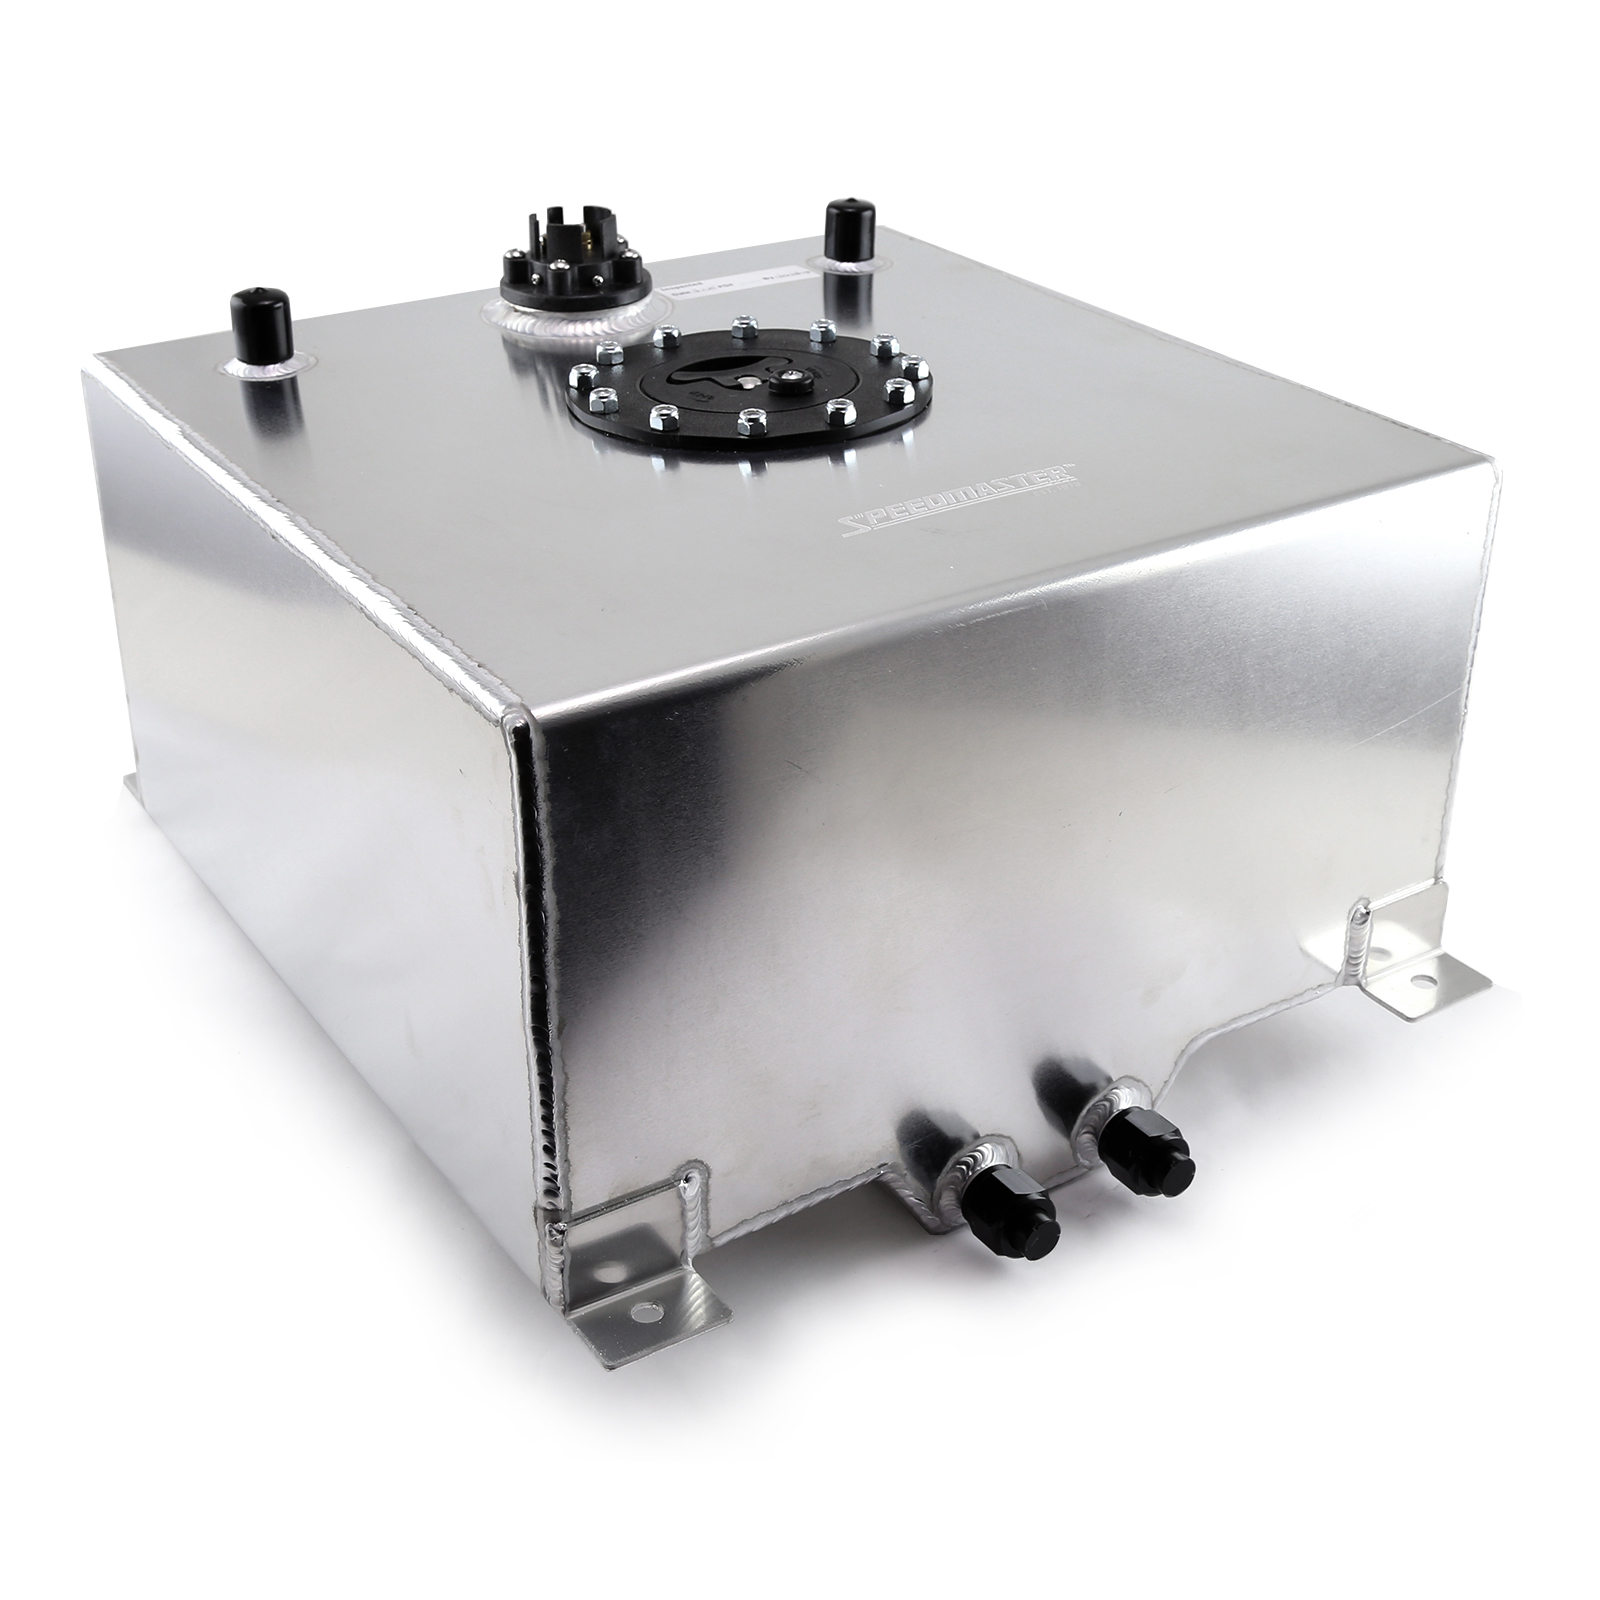 Speedmaster 10 Gallon / 40 Litre Aluminum Fuel Cell w/Sending Unit